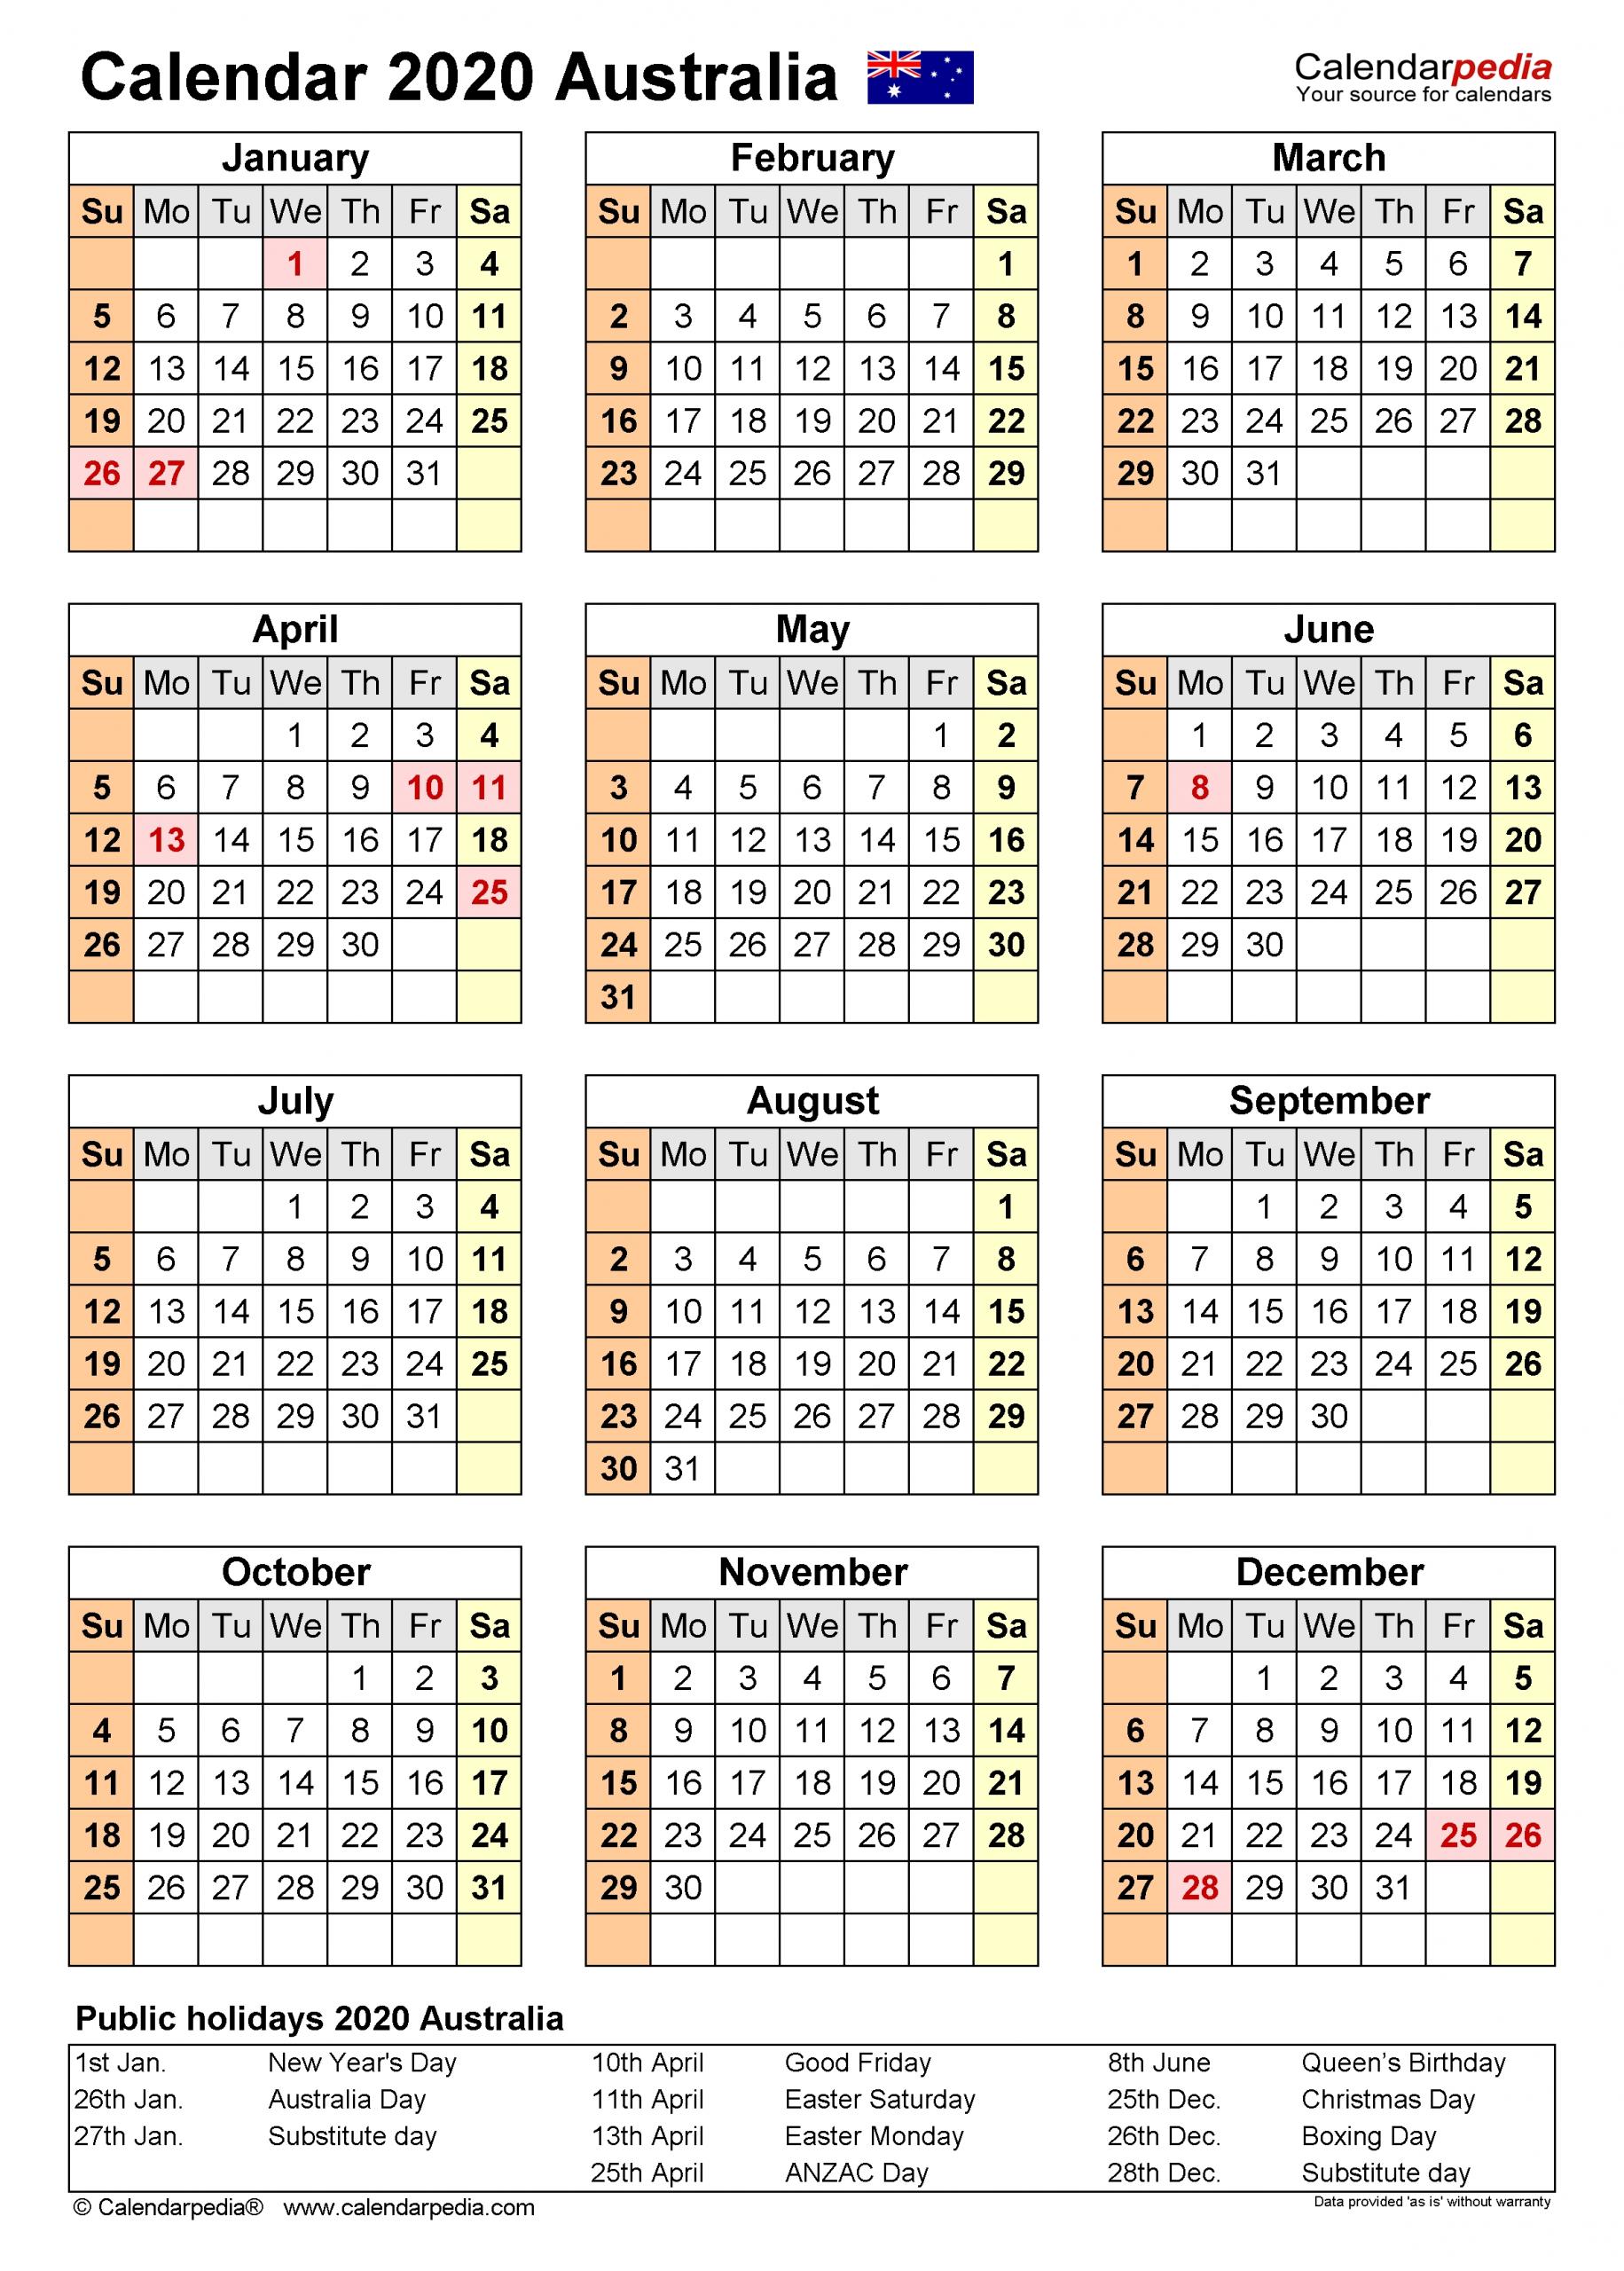 Australia Calendar 2020 - Free Printable Pdf Templates  Financial Years Dates Australia